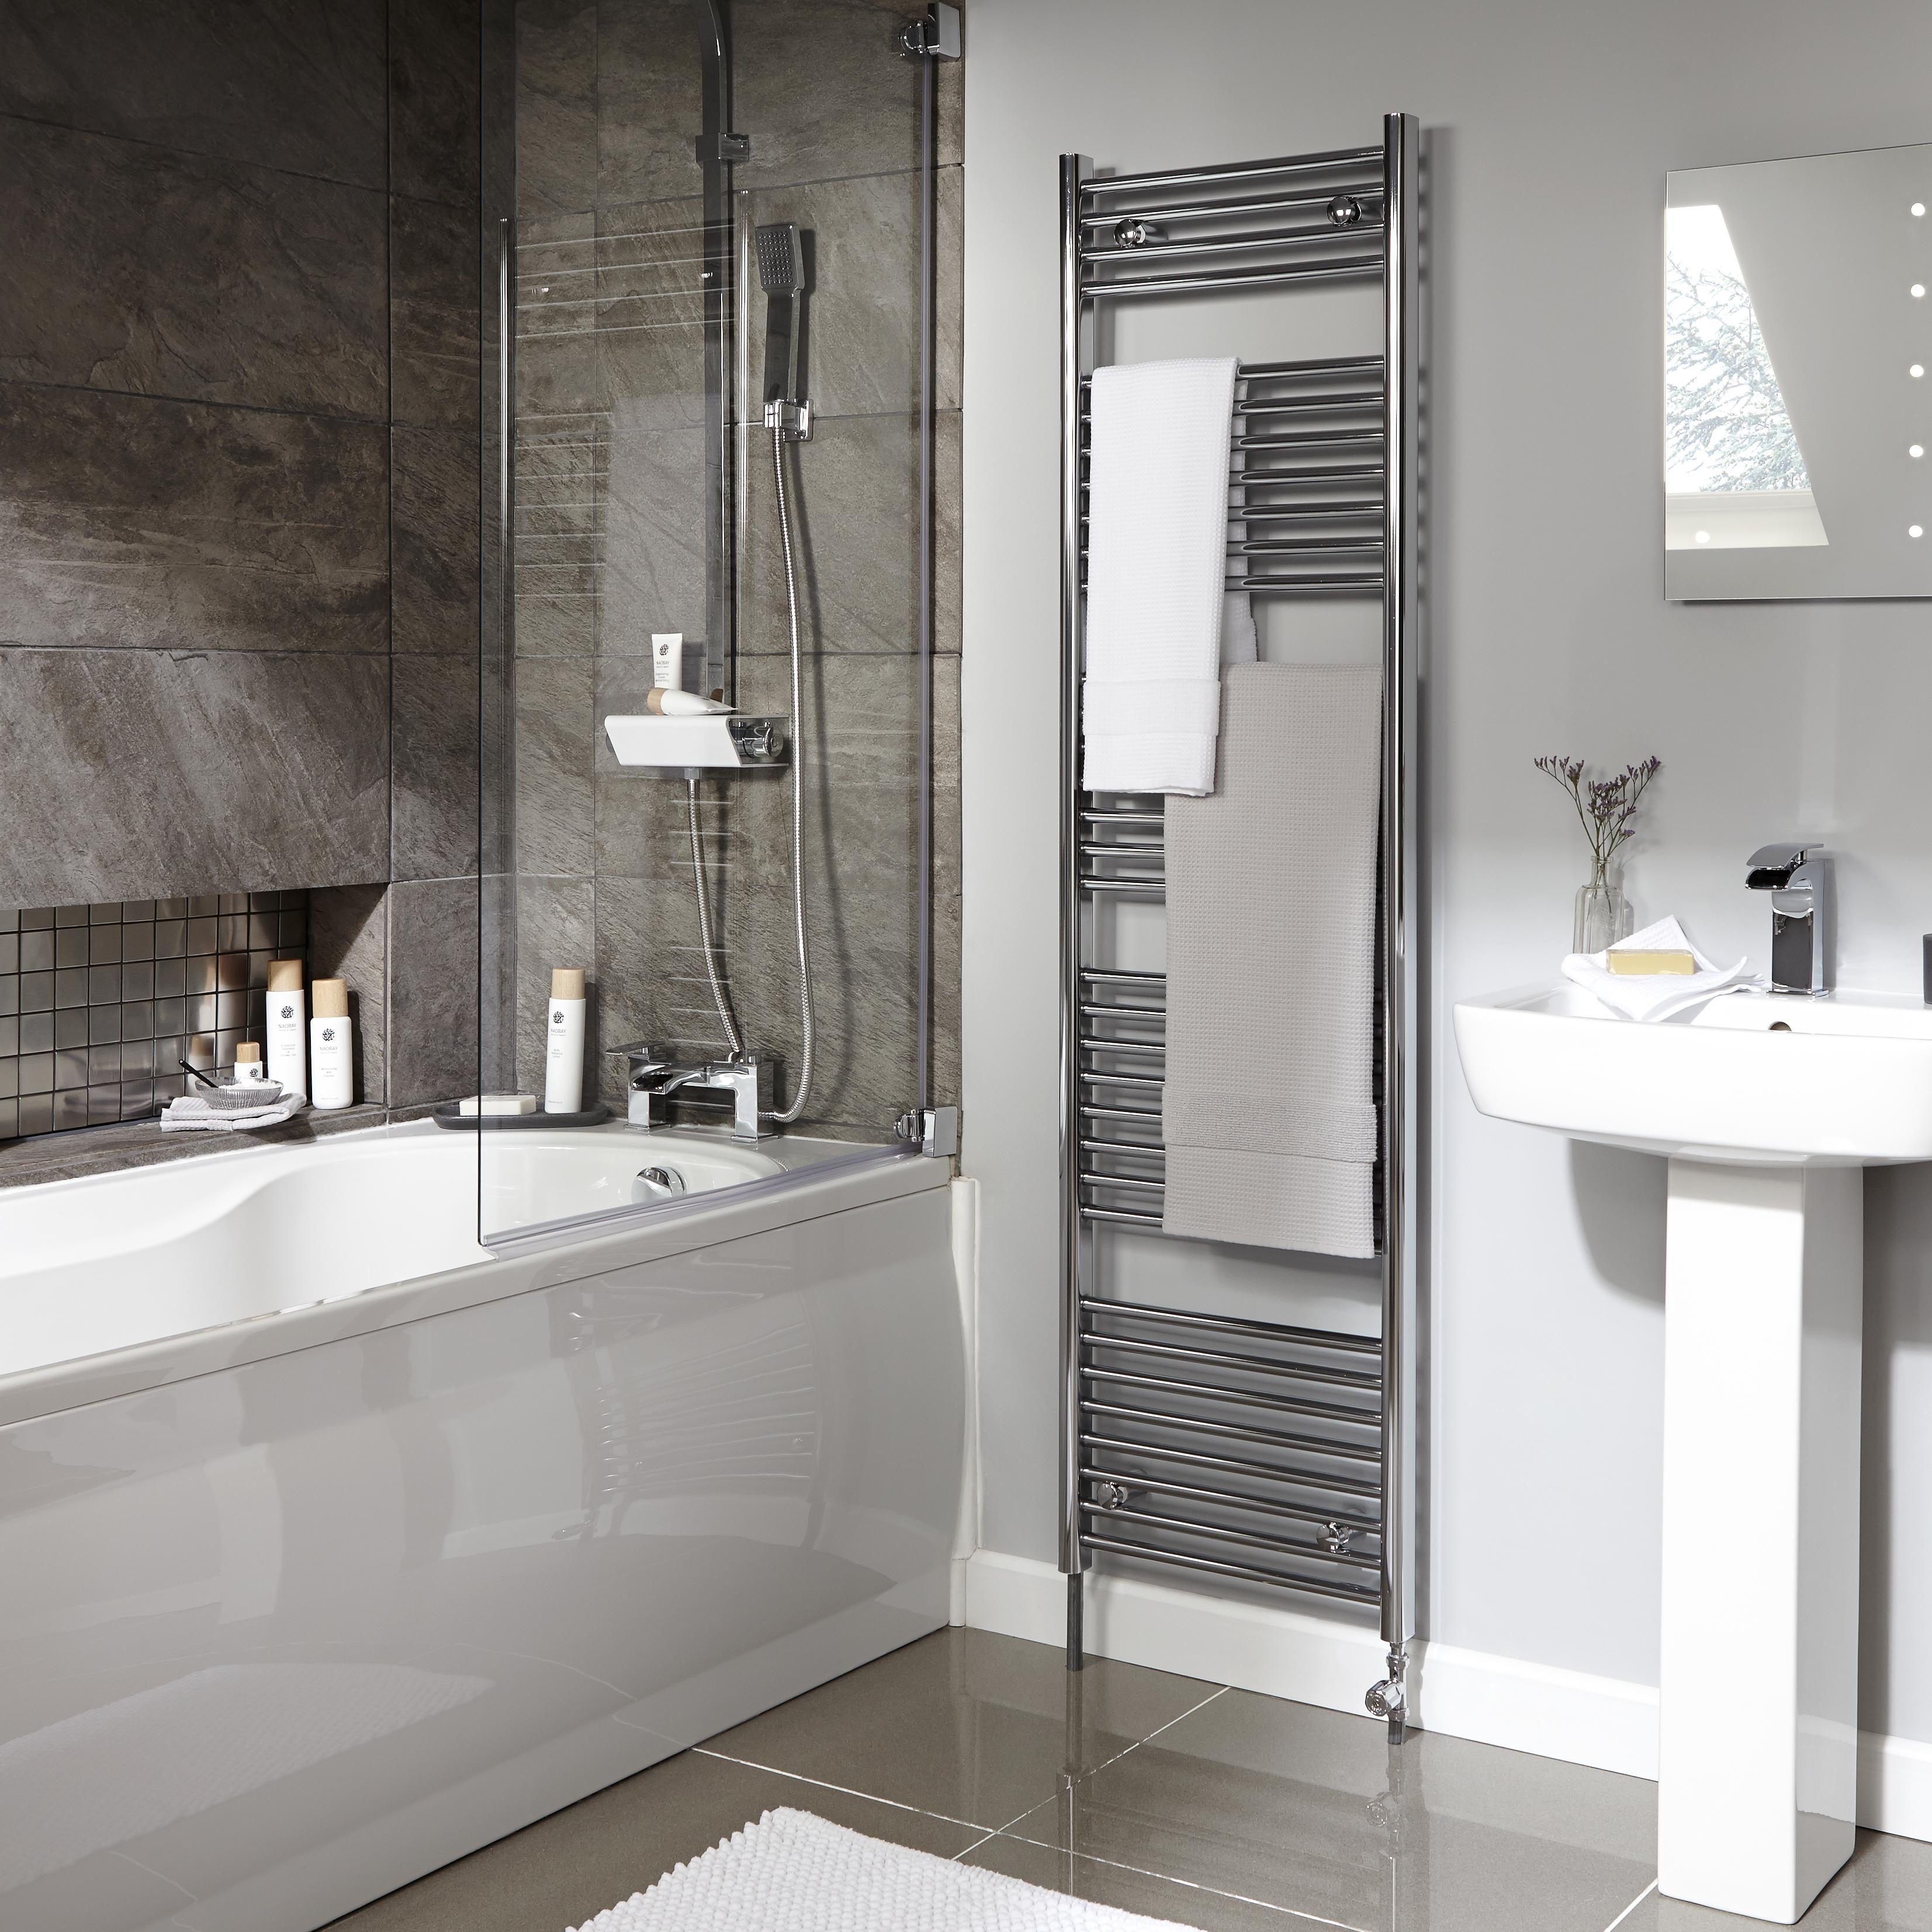 & Towel radiator buying guide | Ideas \u0026 Advice | DIY at B\u0026Q